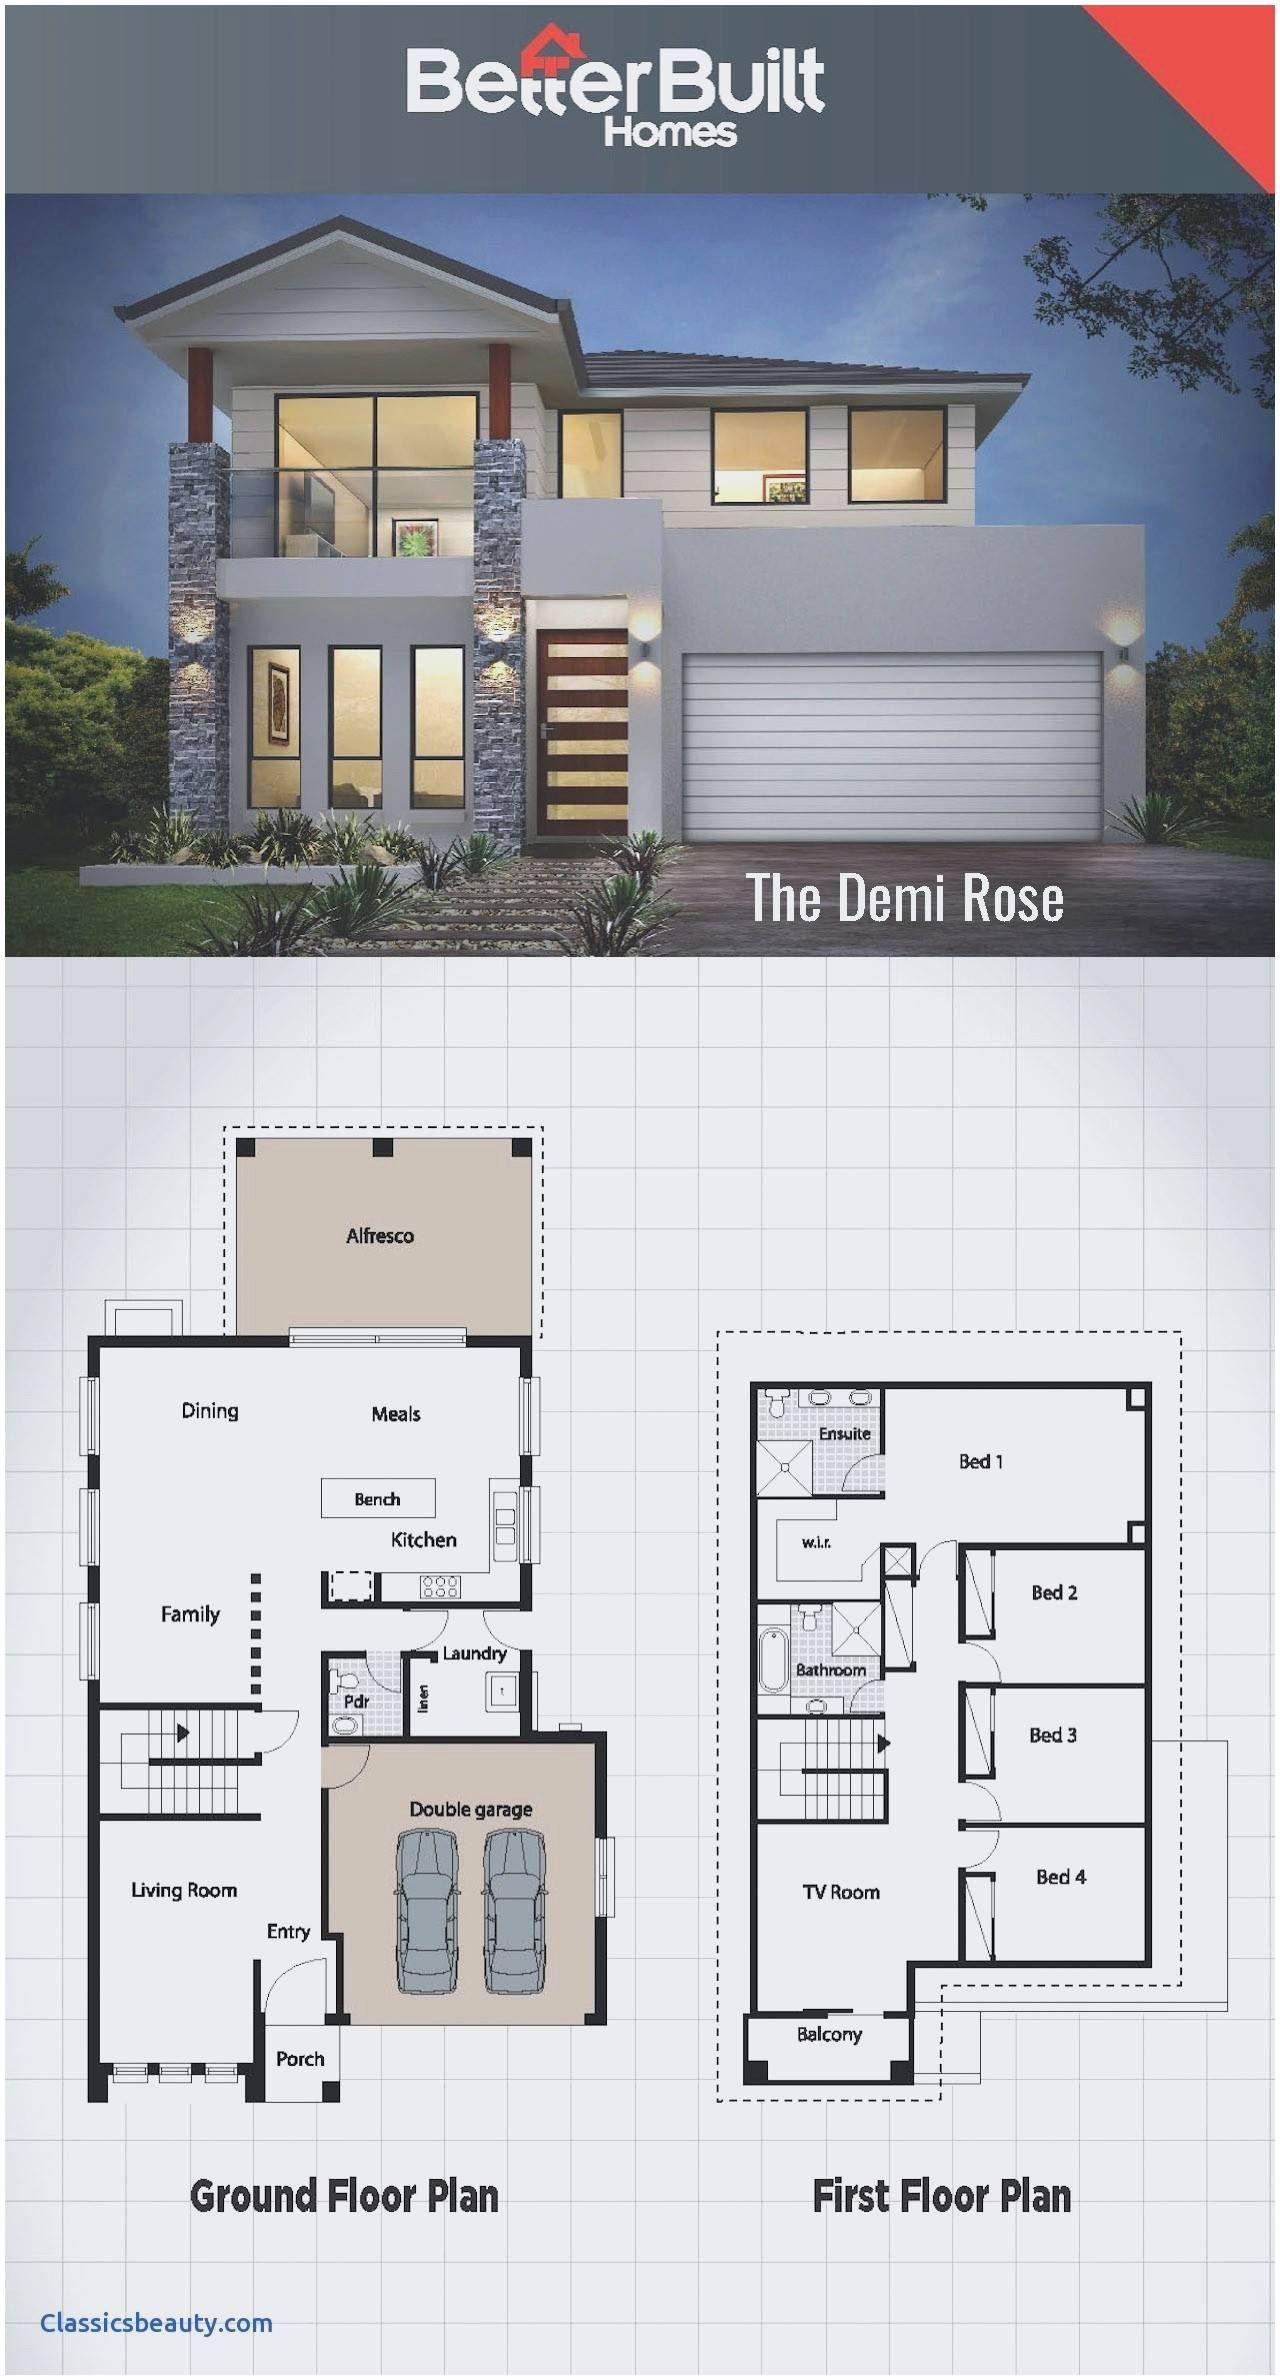 Cob House Designs Luxury 30 Alternative 3 Bedroom Cob House Plans Design Modern House Floor Plans House Blueprints Double Storey House